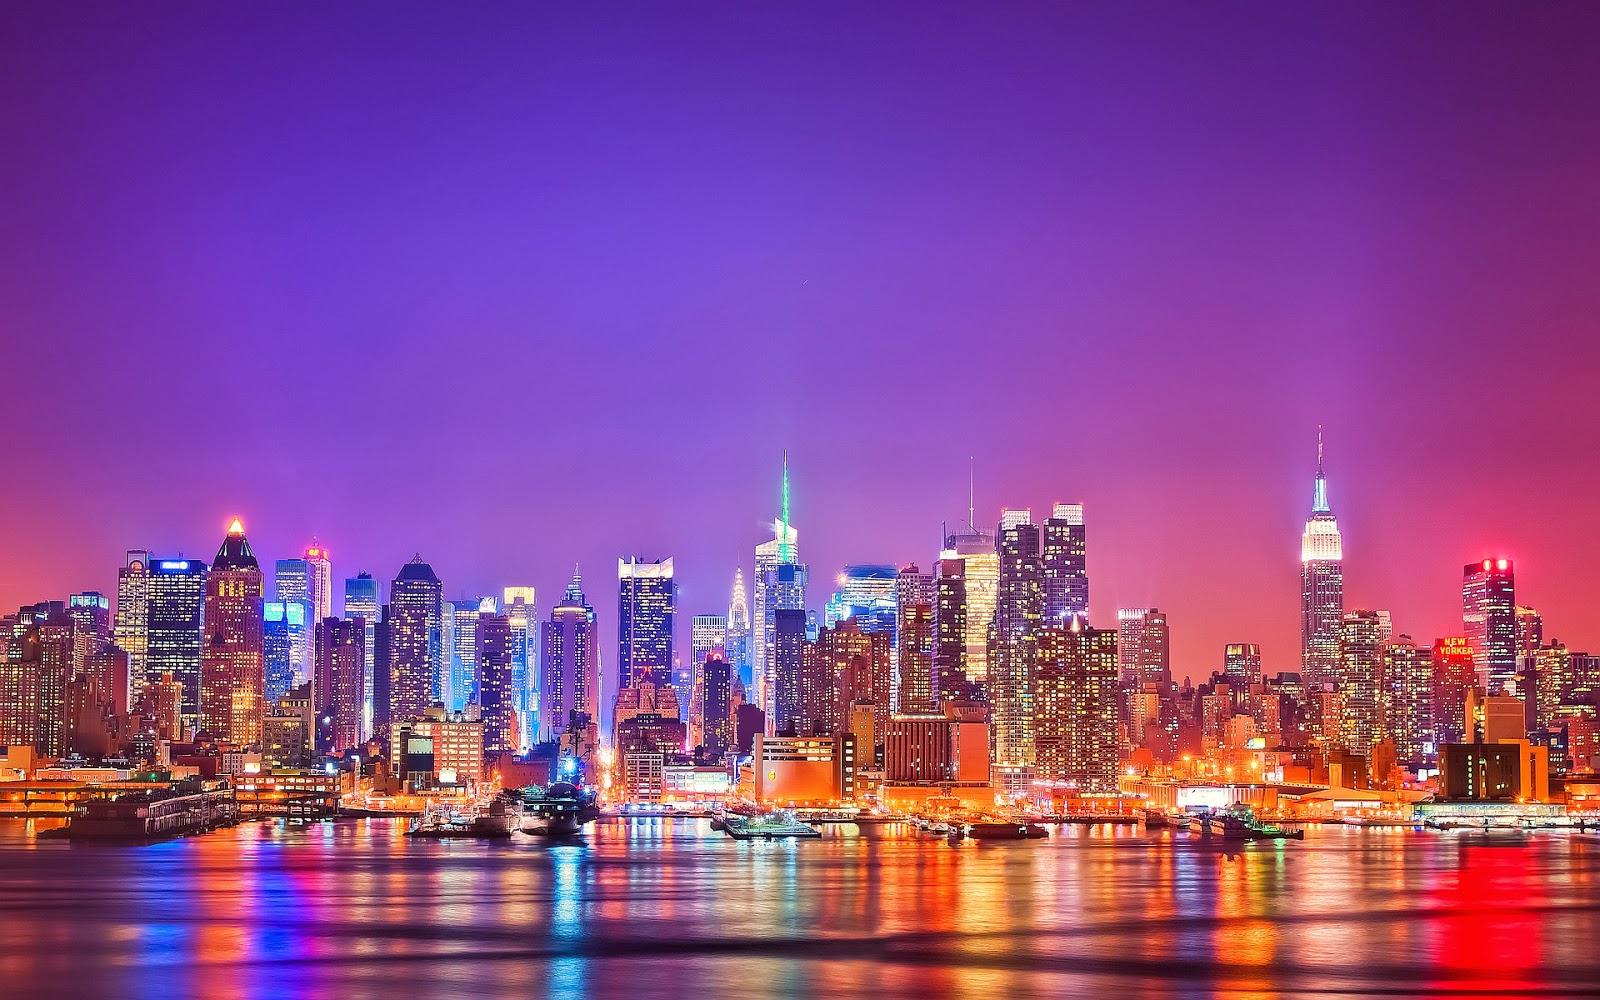 New York City 1600x1000 Download Hd Wallpaper Wallpapertip